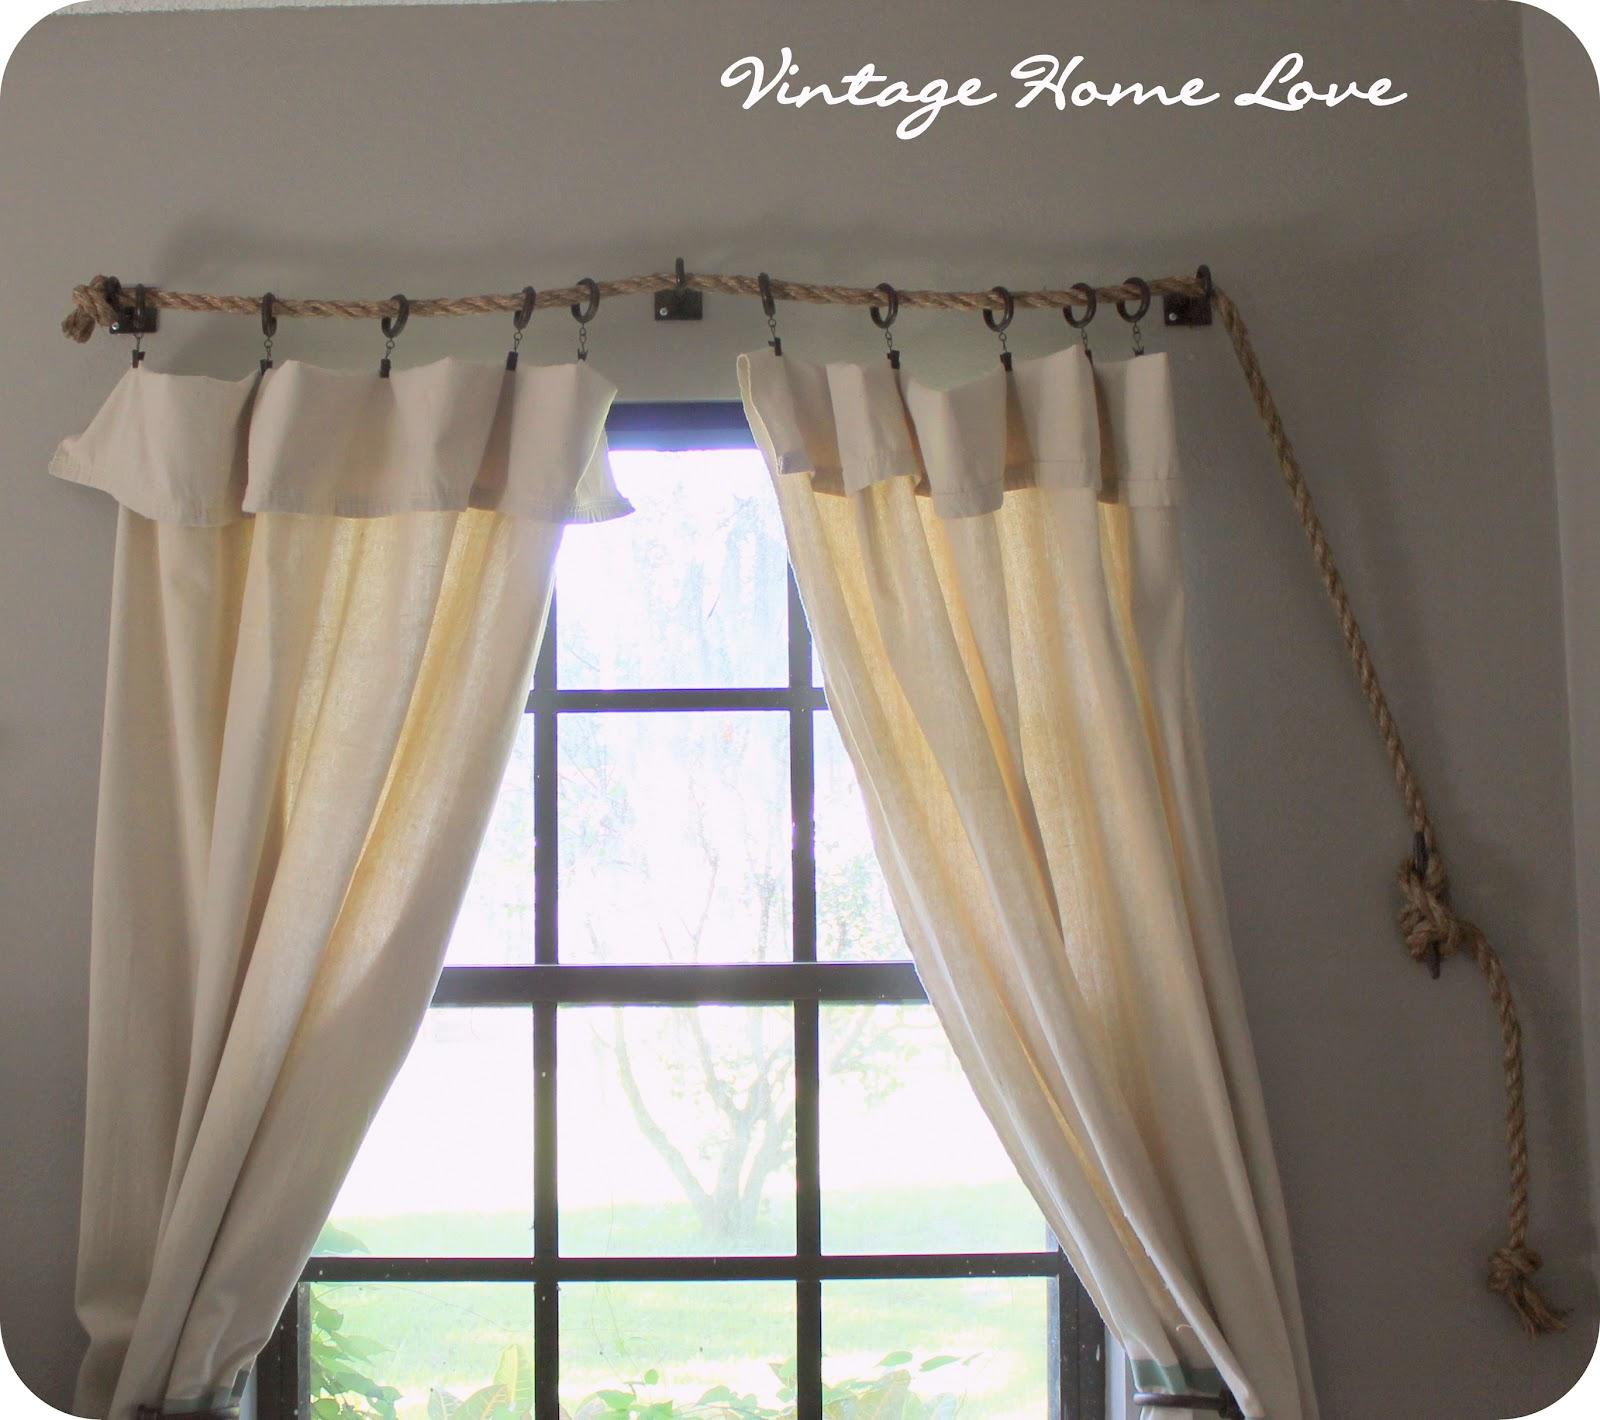 Diy Curtain Rods Rustic Crafts Chic Decor